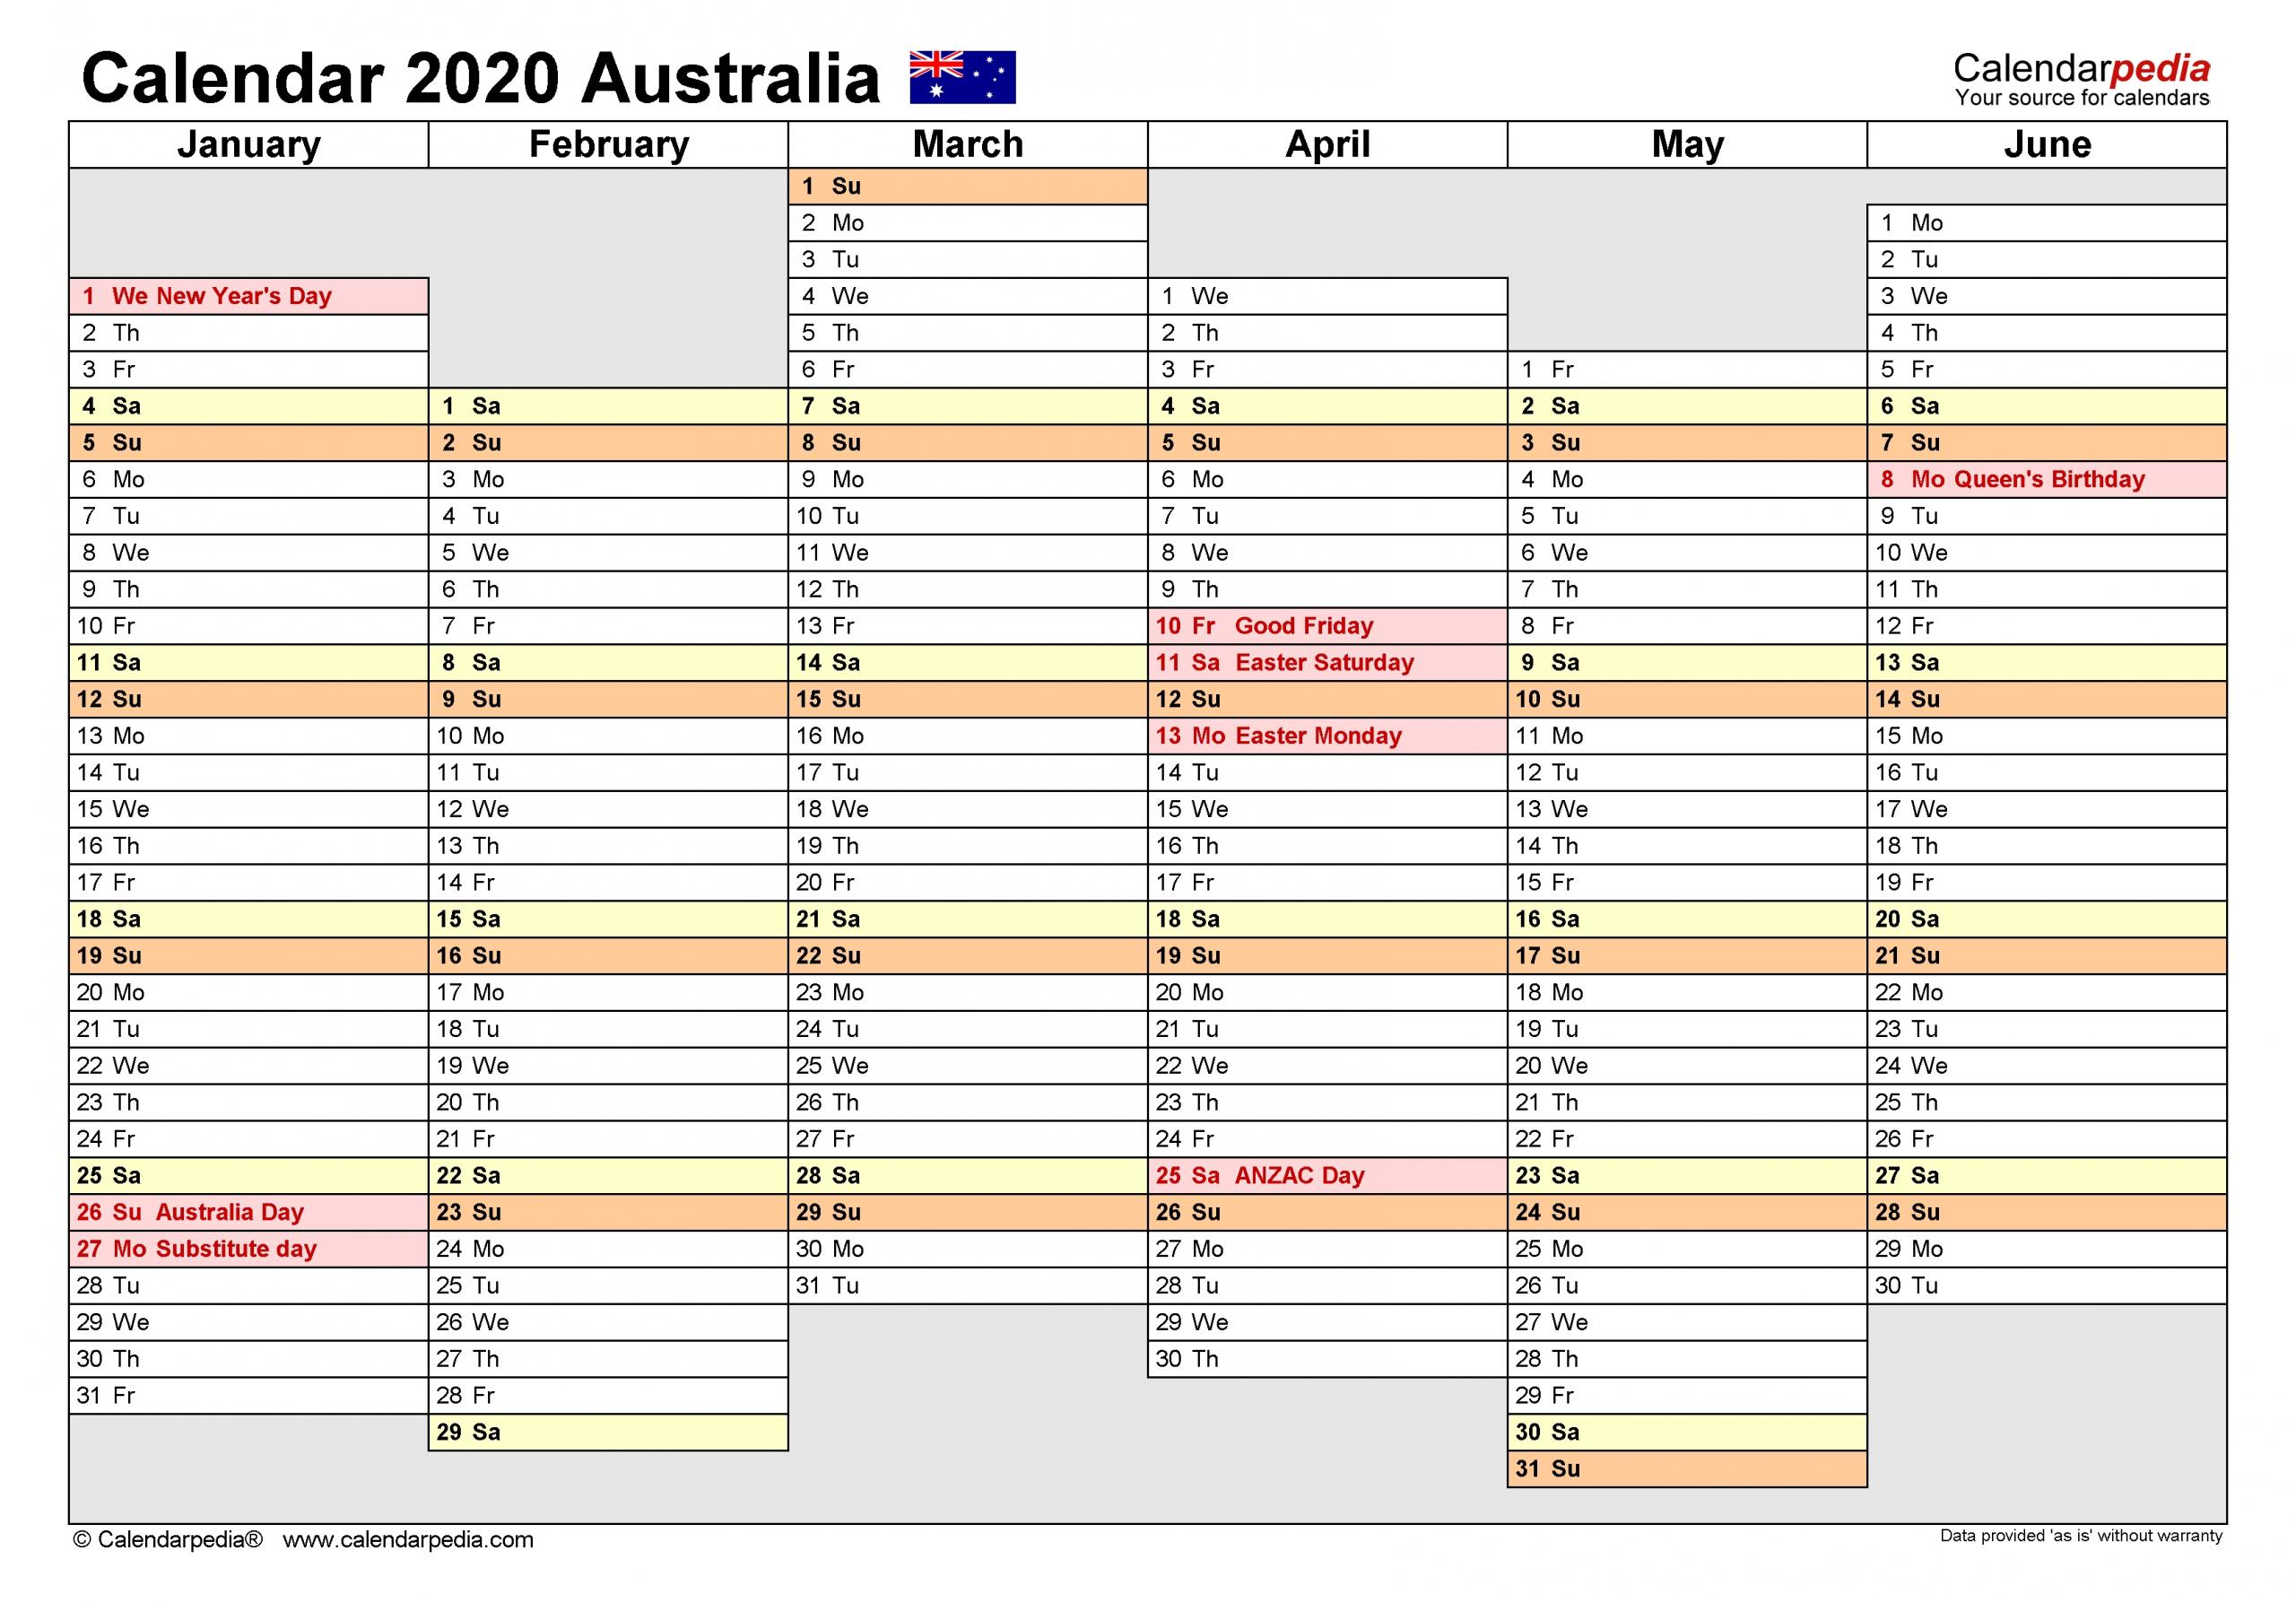 Australia Calendar 2020 - Free Printable Pdf Templates  Australian 20 20 Six Month Calendars Template